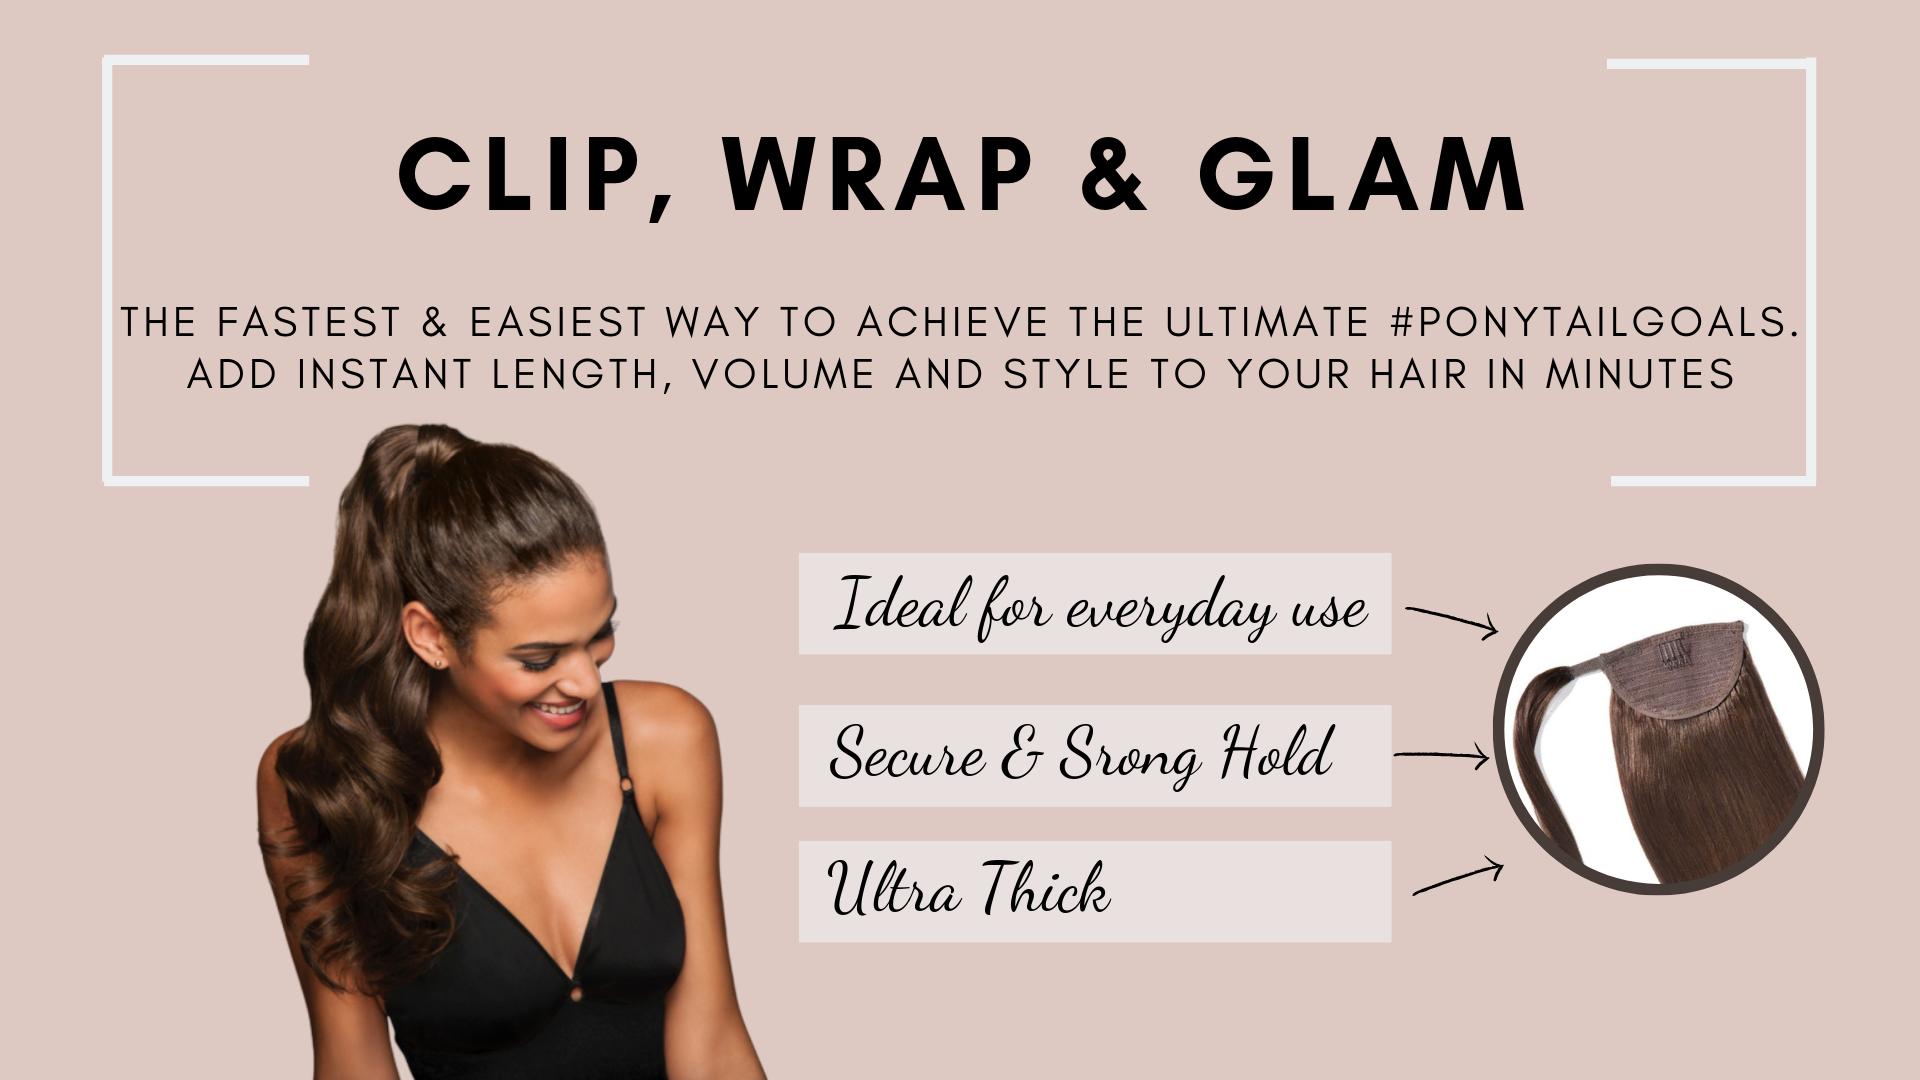 Erabella #1 Jet Black clip in hair extensions